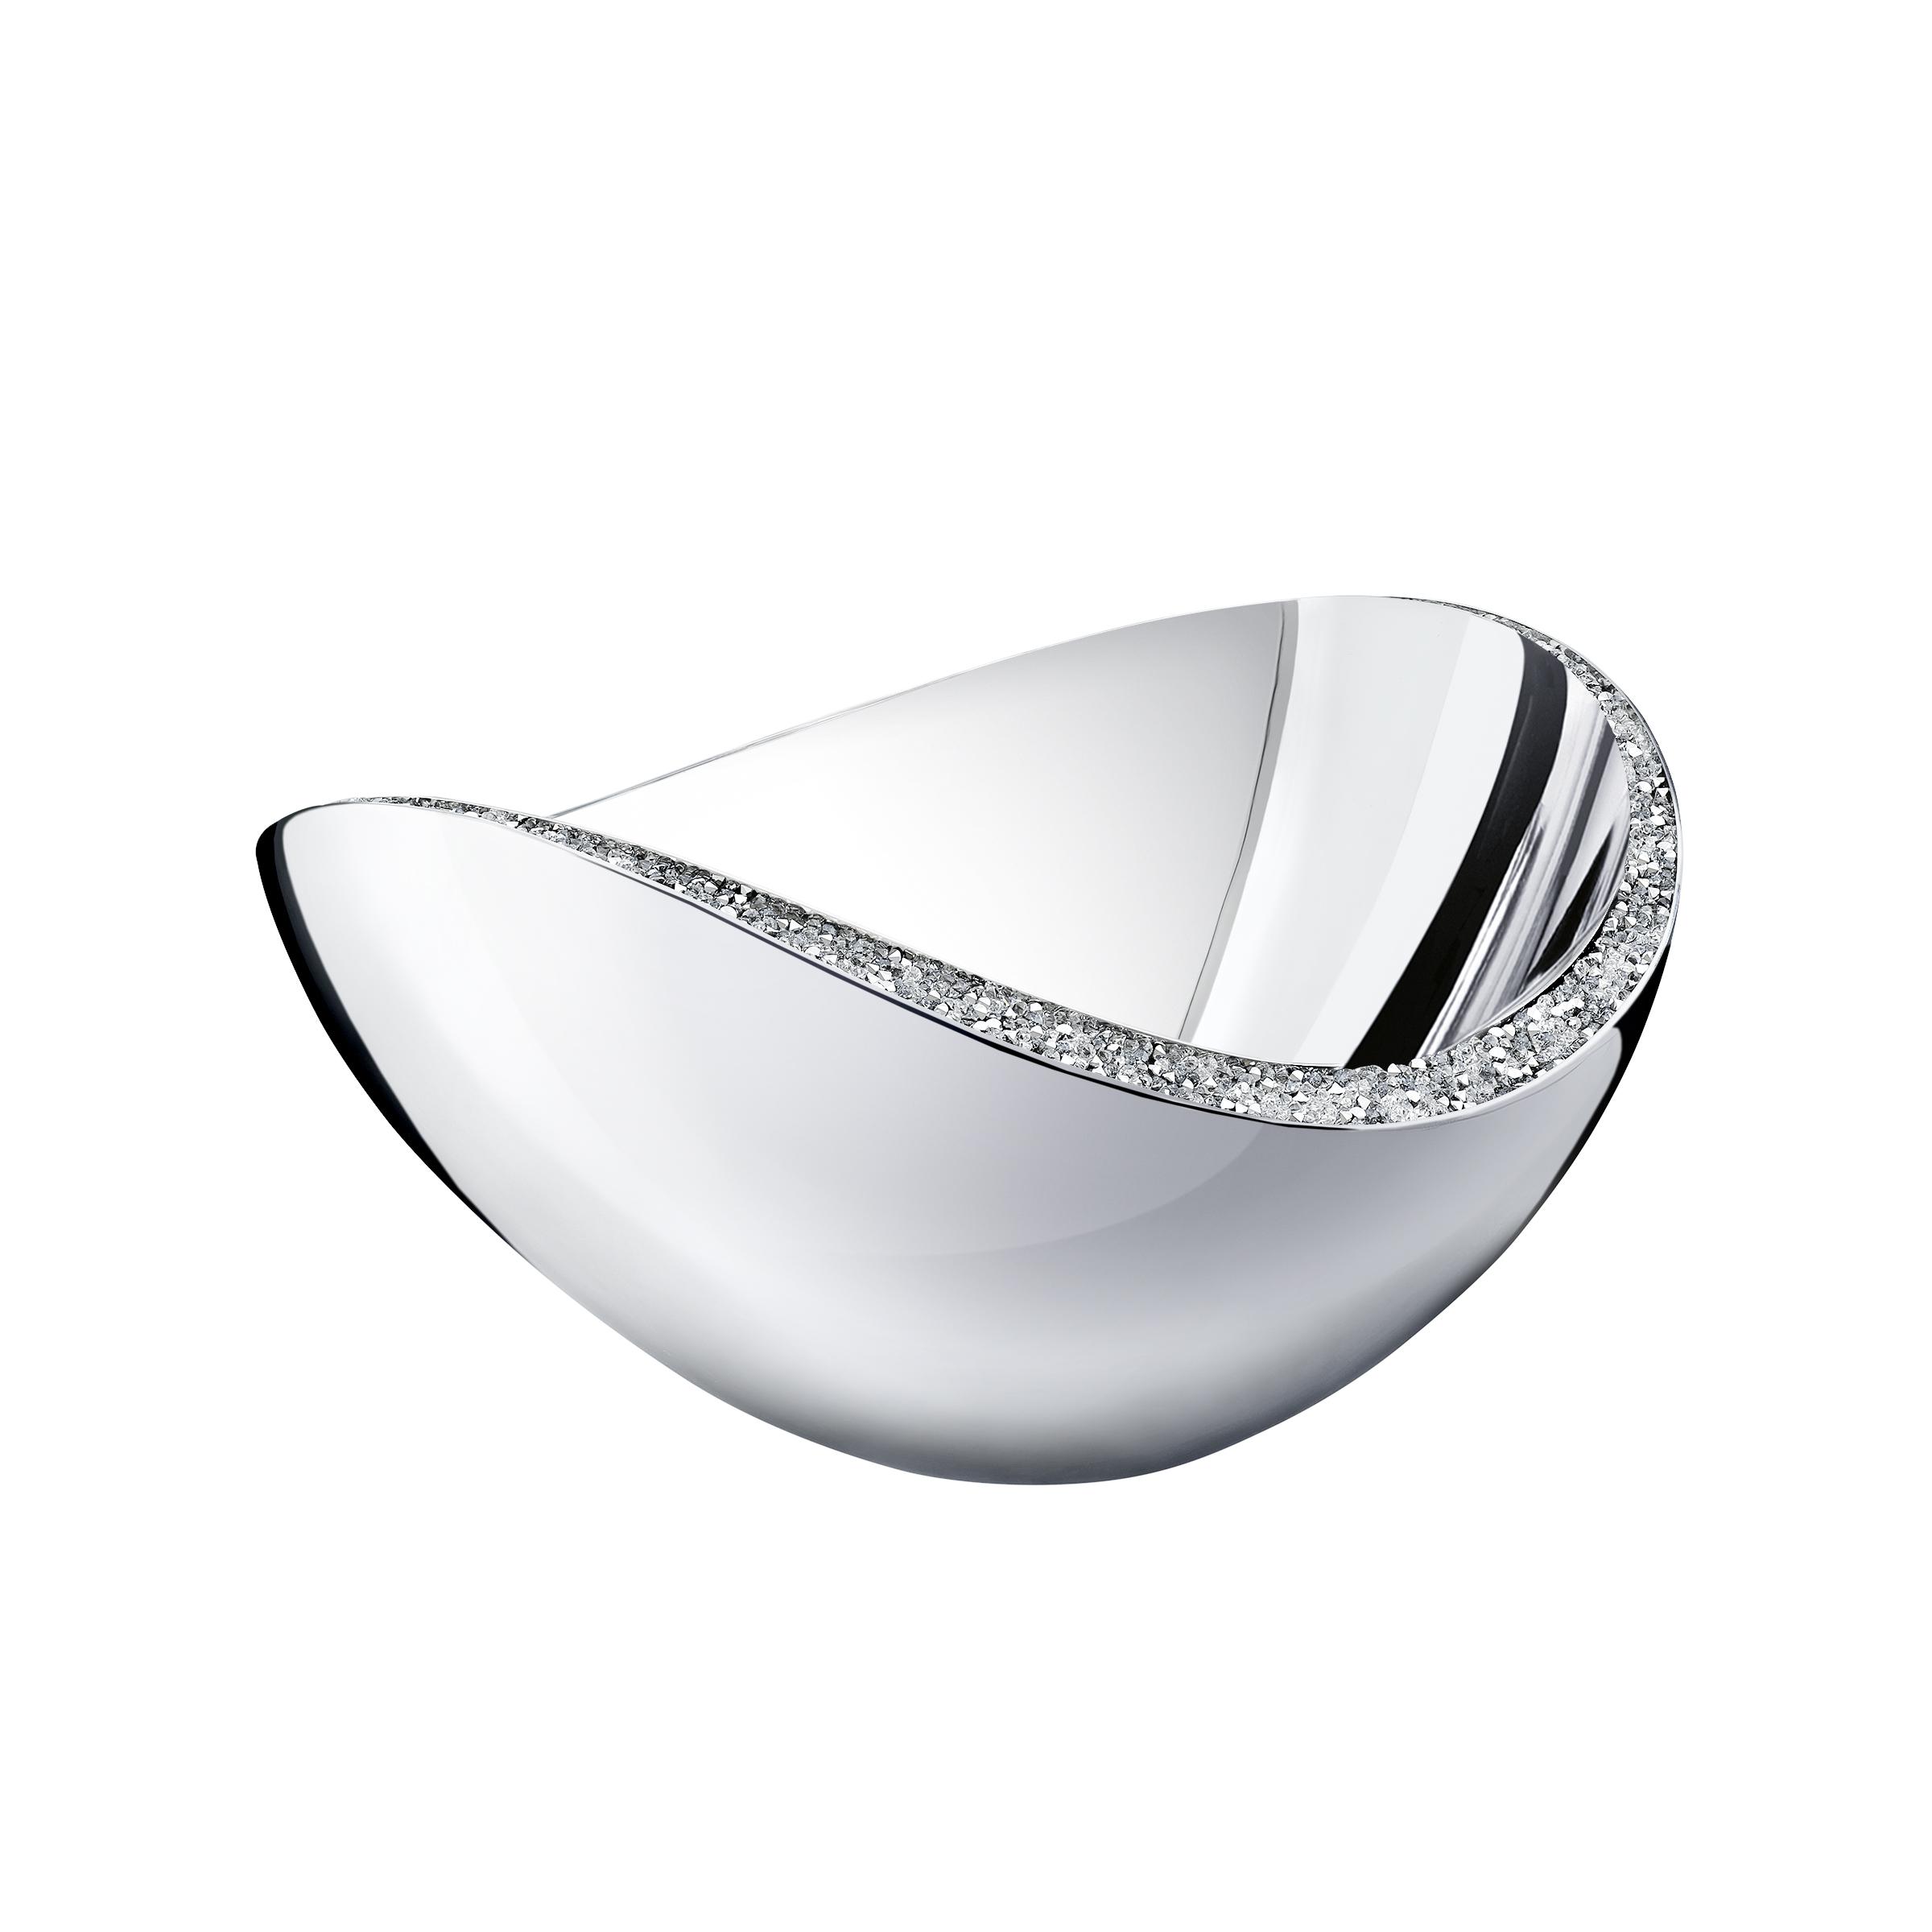 Minera Decorative Bowl, medium